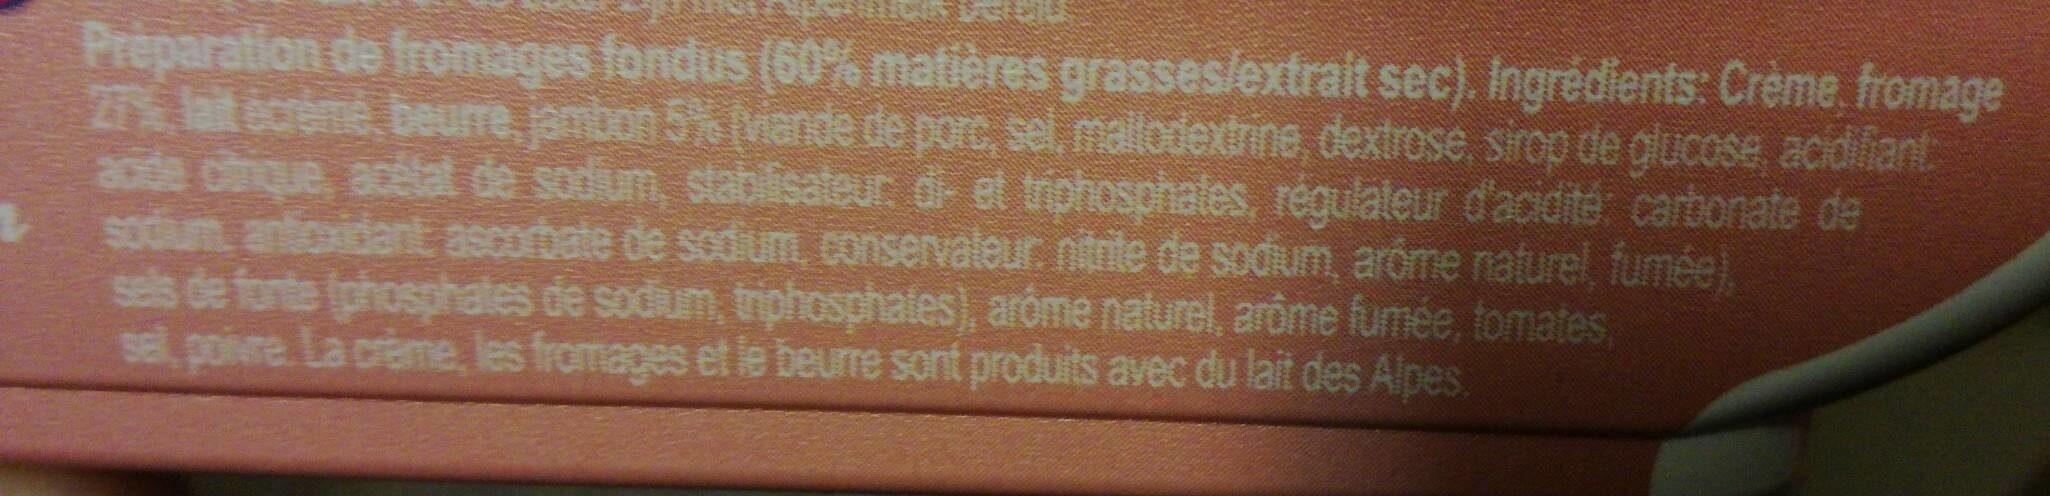 Fromage fondu jambon - Ingrédients - fr